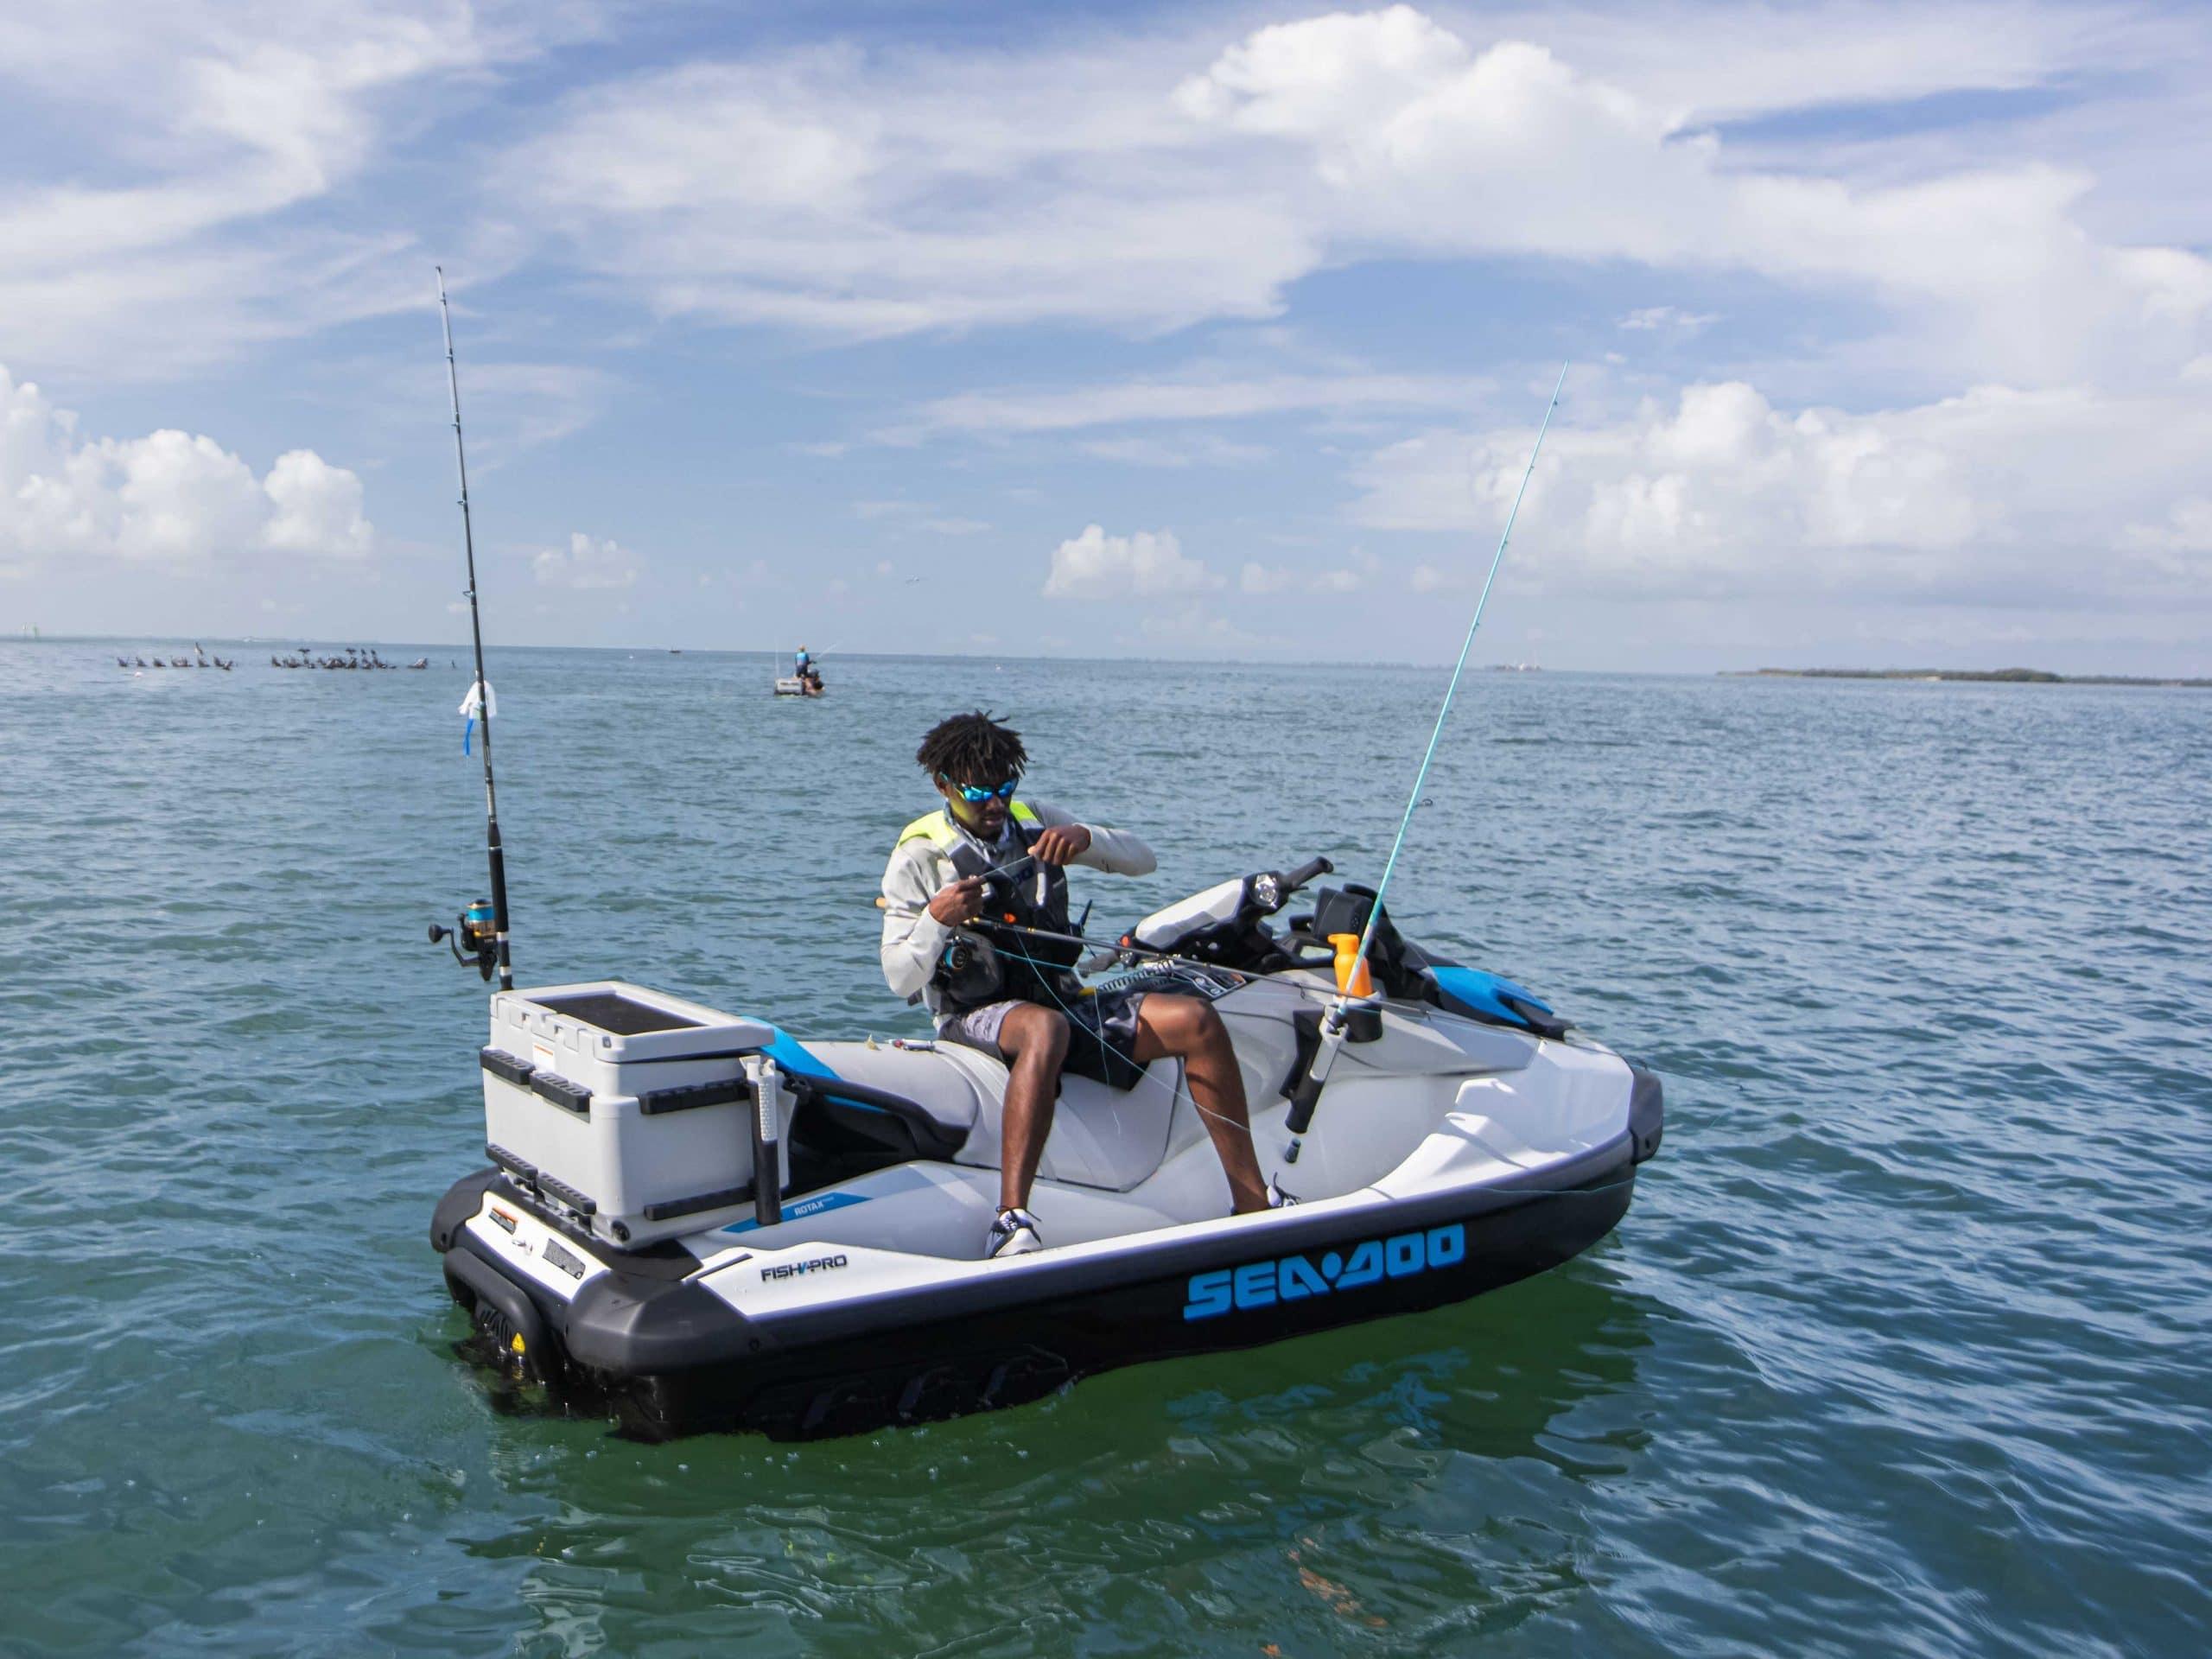 Le Sea-Doo FishPro Scout. Source: Le rangement avant du Sea-Doo FishPro Scout. Source: https://www.sea-doo.com/ca/fr/modeles/sport-fishing/fish-pro-scout.html